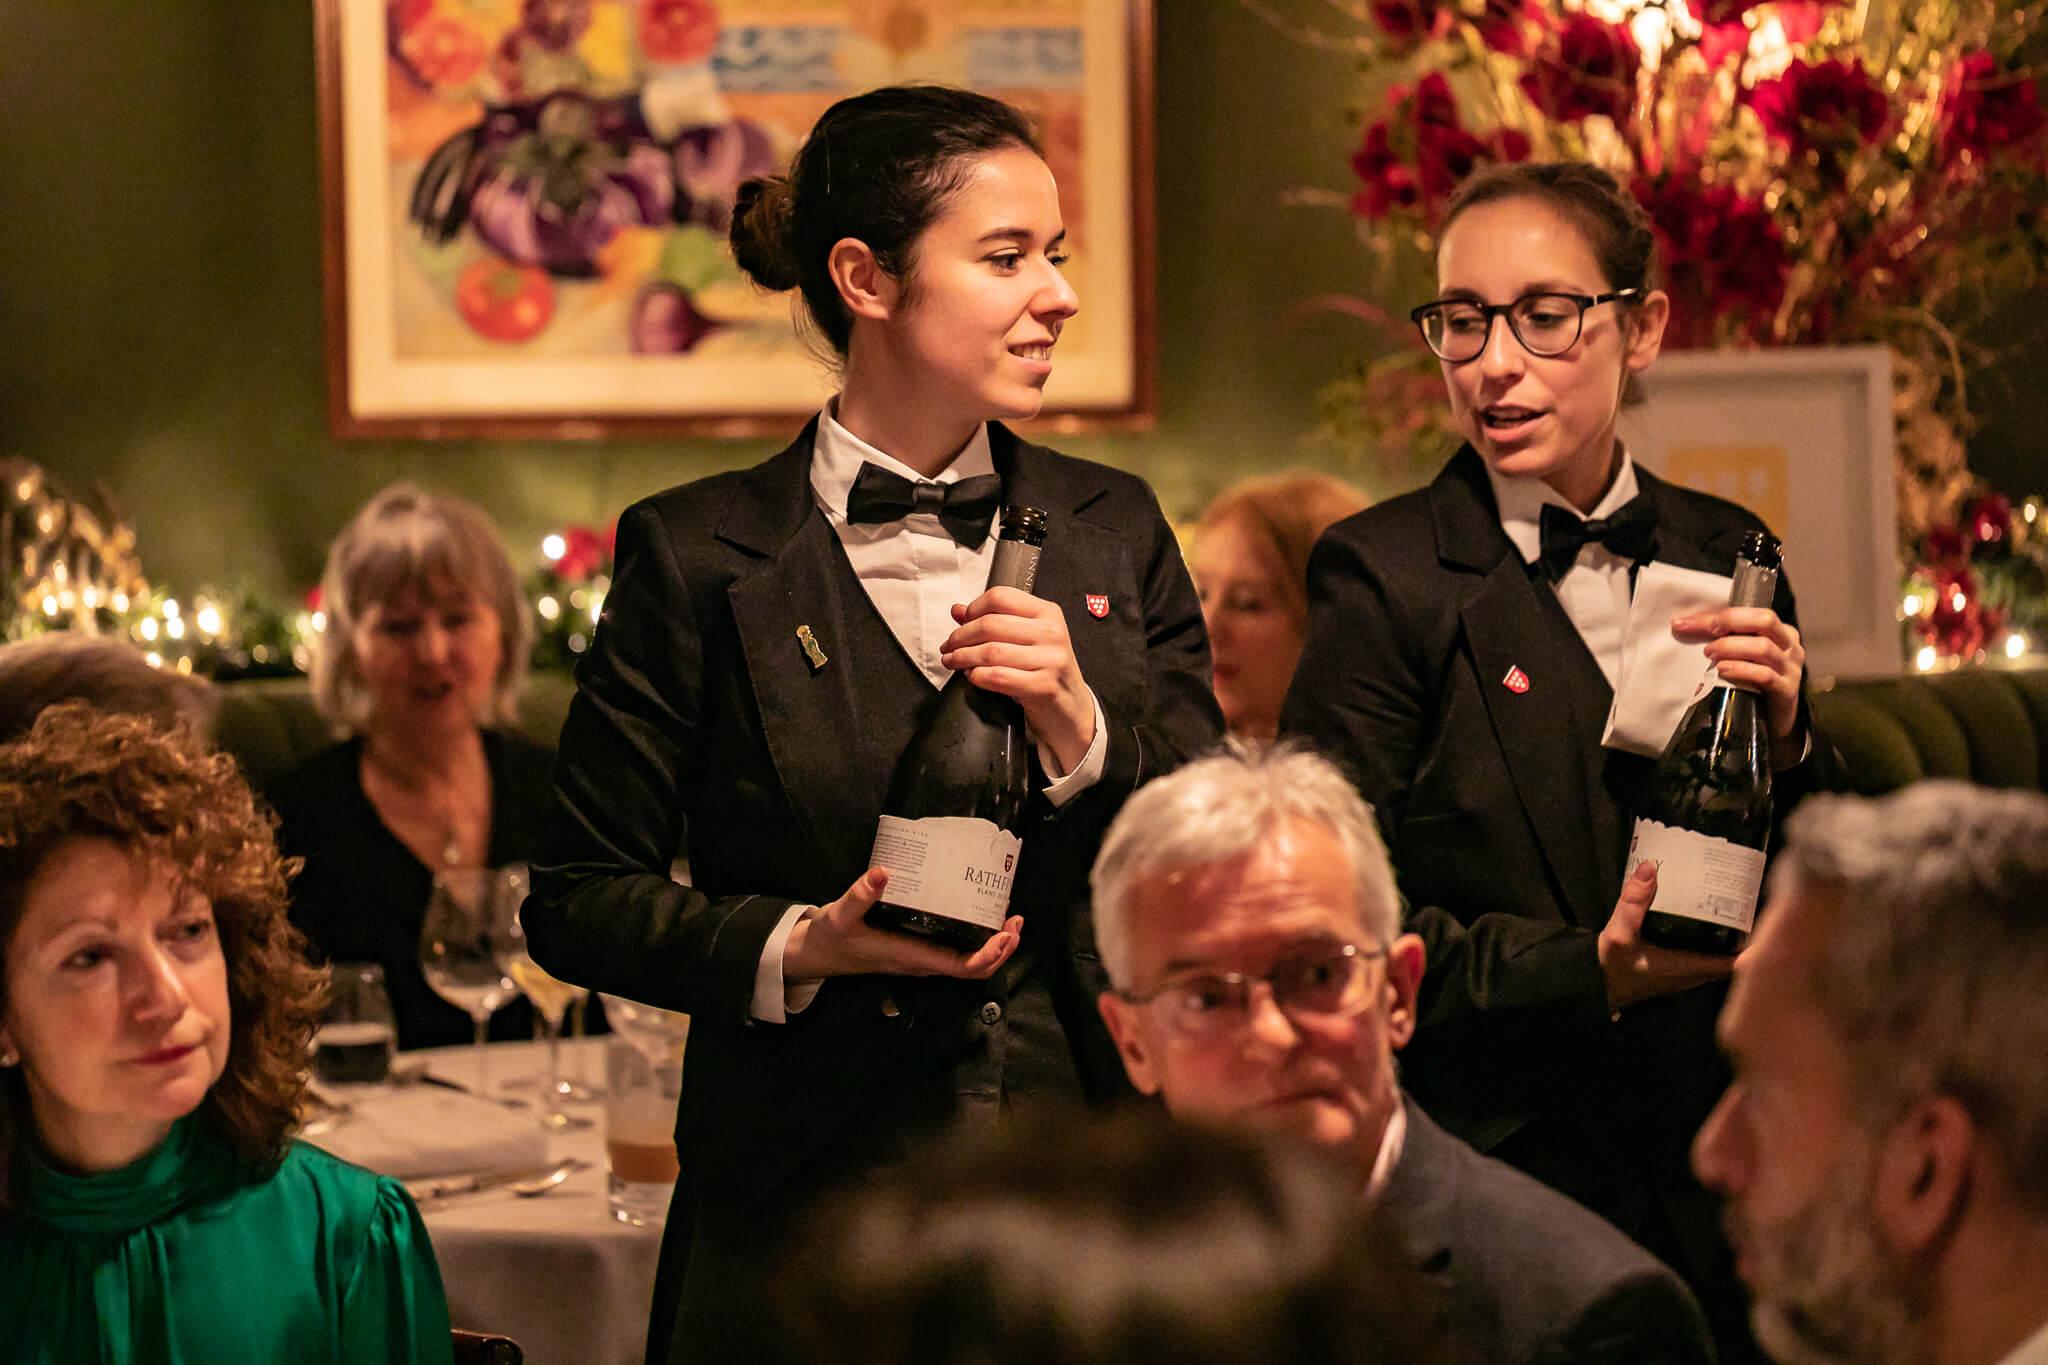 Female Sommeliers Holding Rathfinny Sparkling Wine